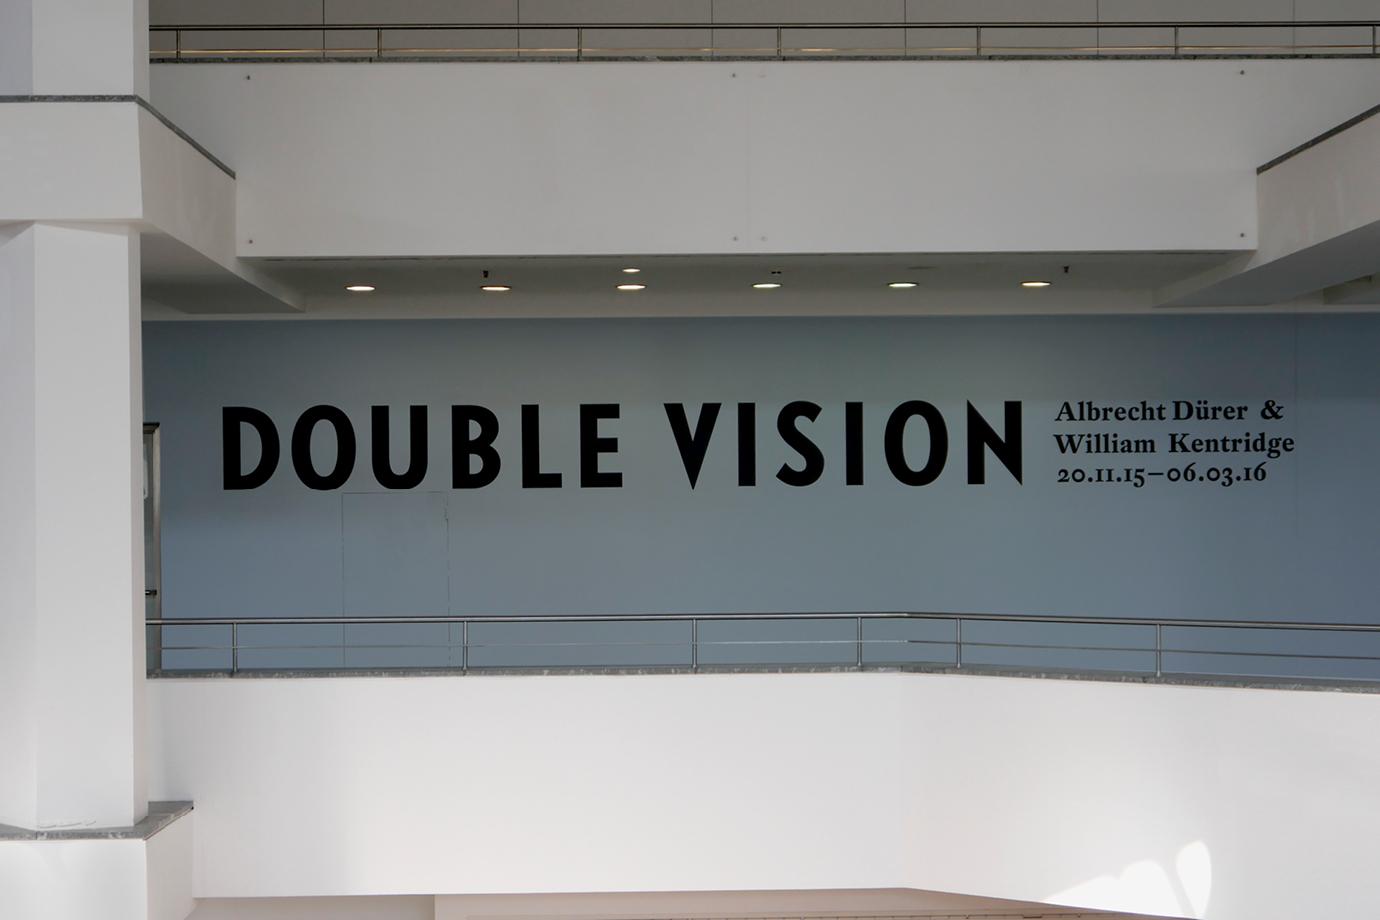 http://e-o-t.de/wordpress/wp-content/uploads/2017/01/2014_eot-DoubleVision-Exhibition-02.jpg